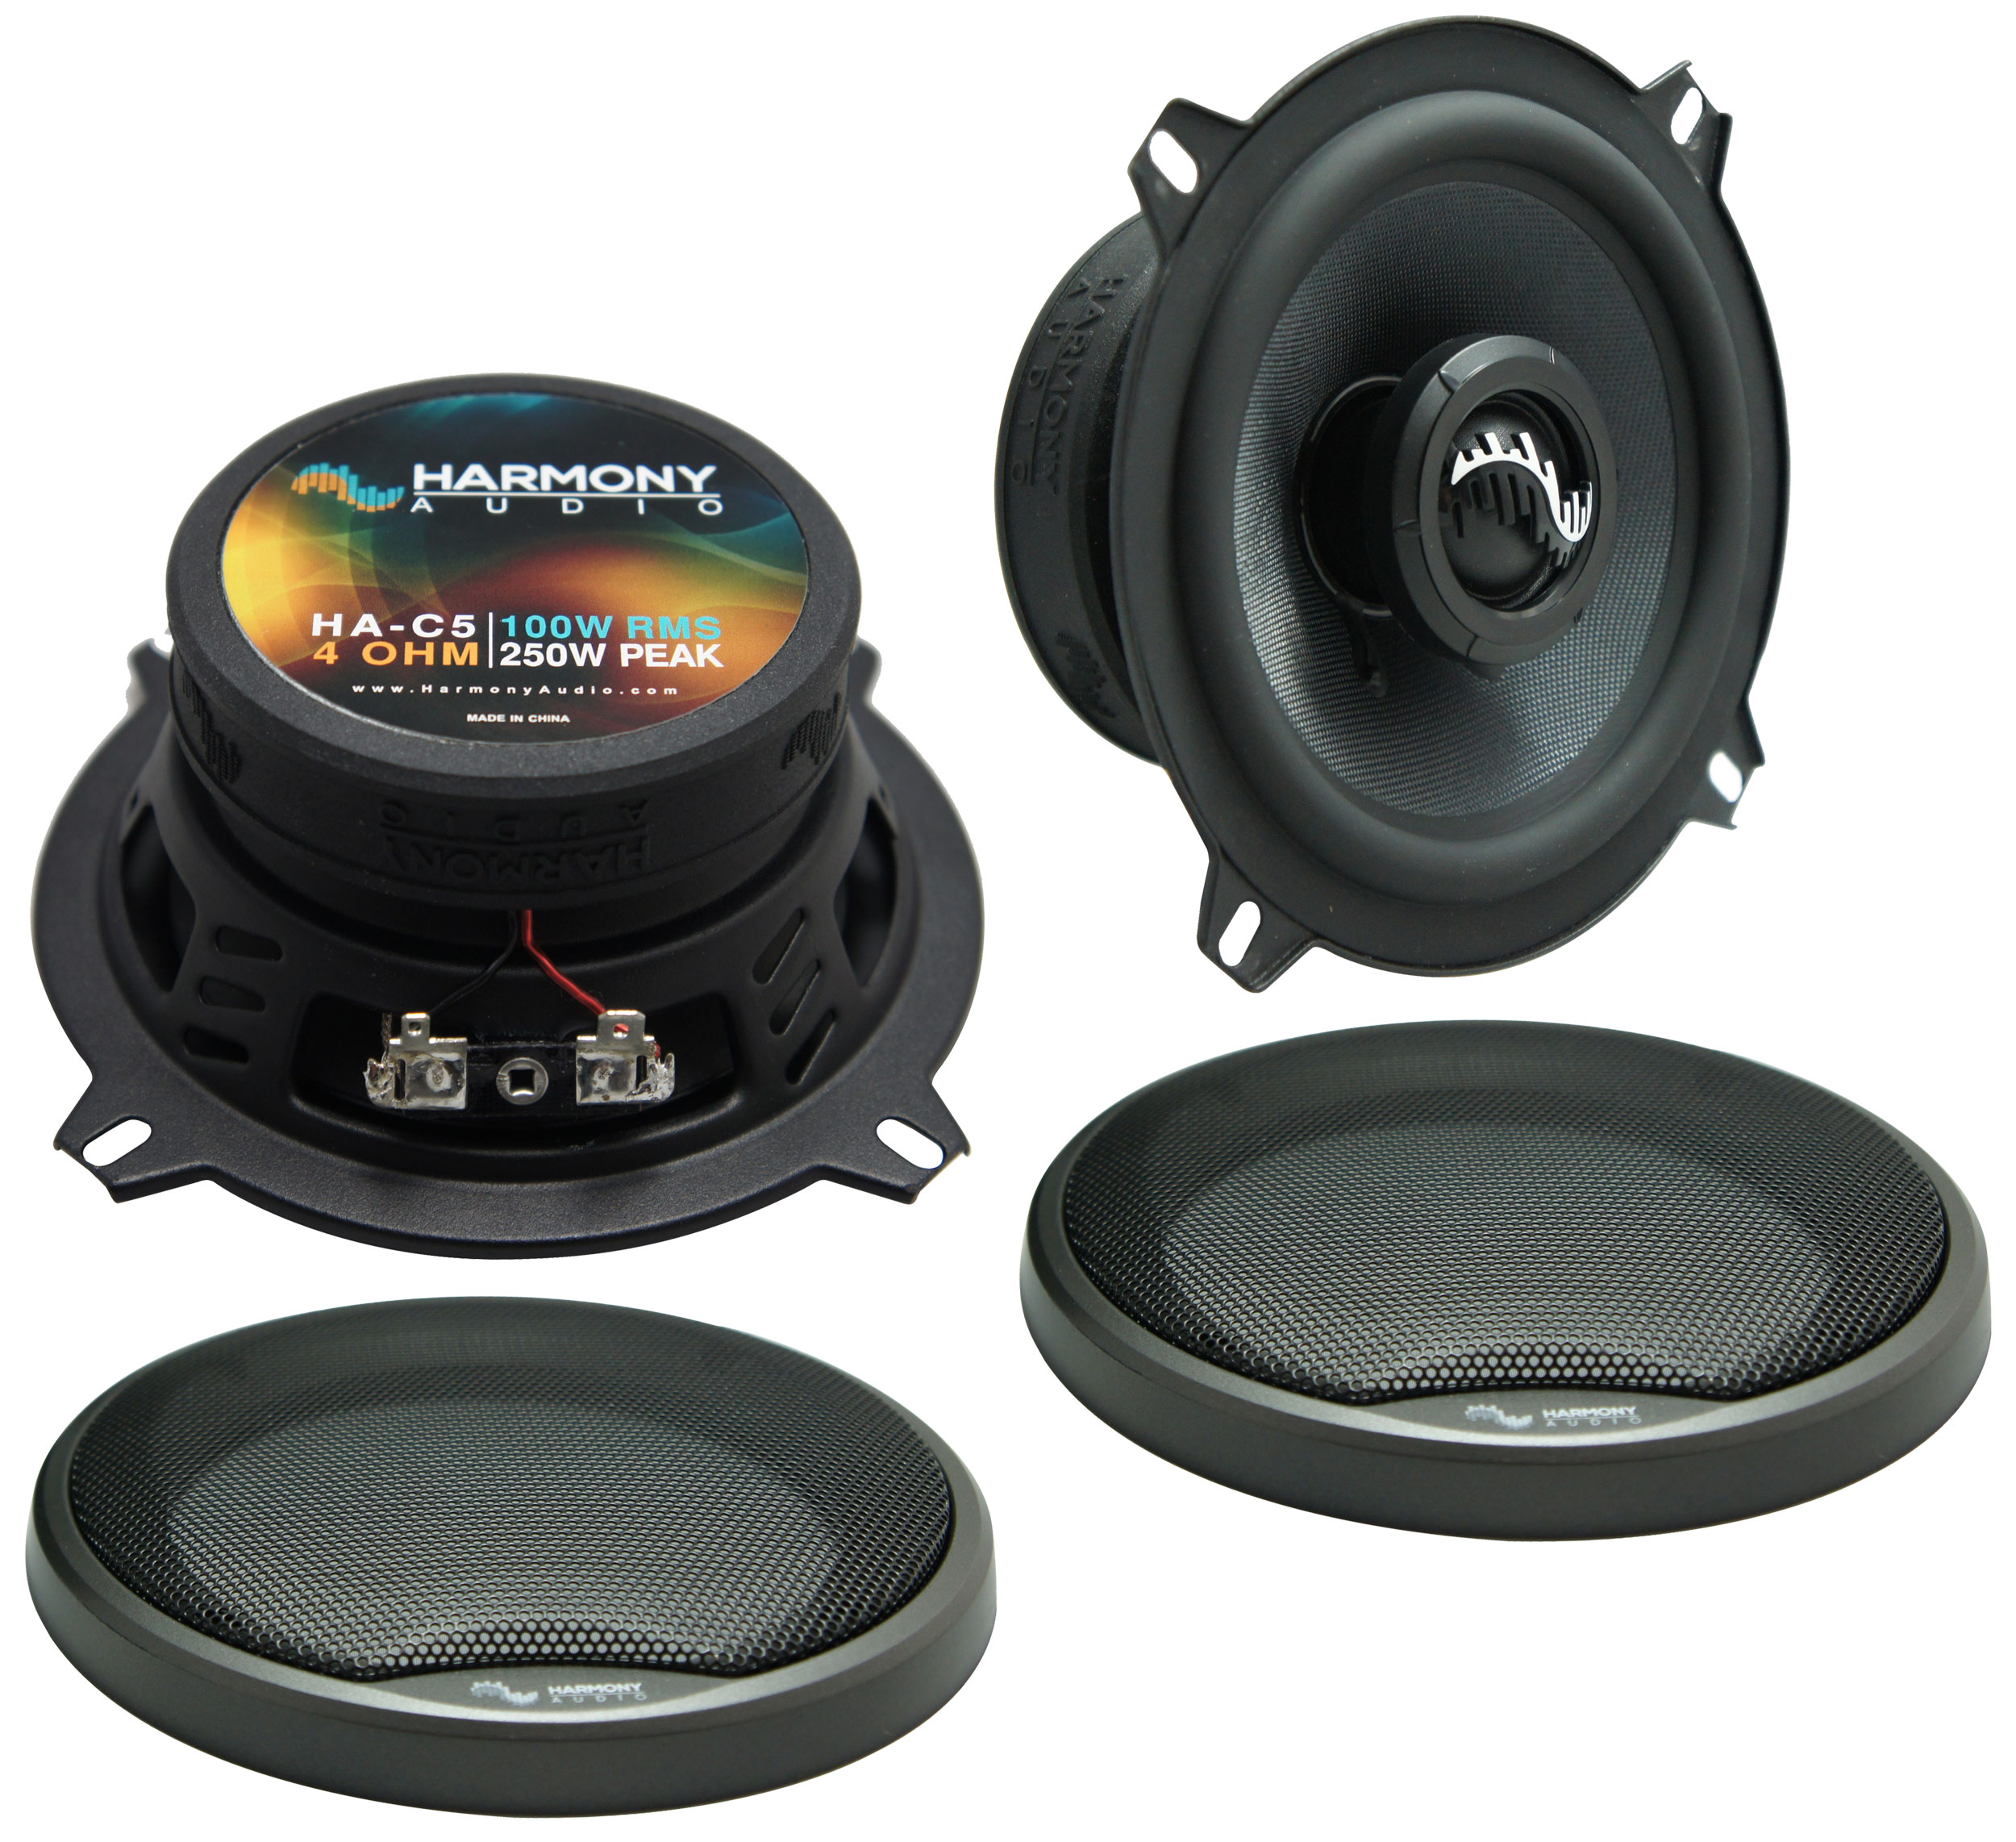 Fits Chrysler LHS 1995-1998 Front Door Replacement Harmony HA-C5 Premium Speakers New